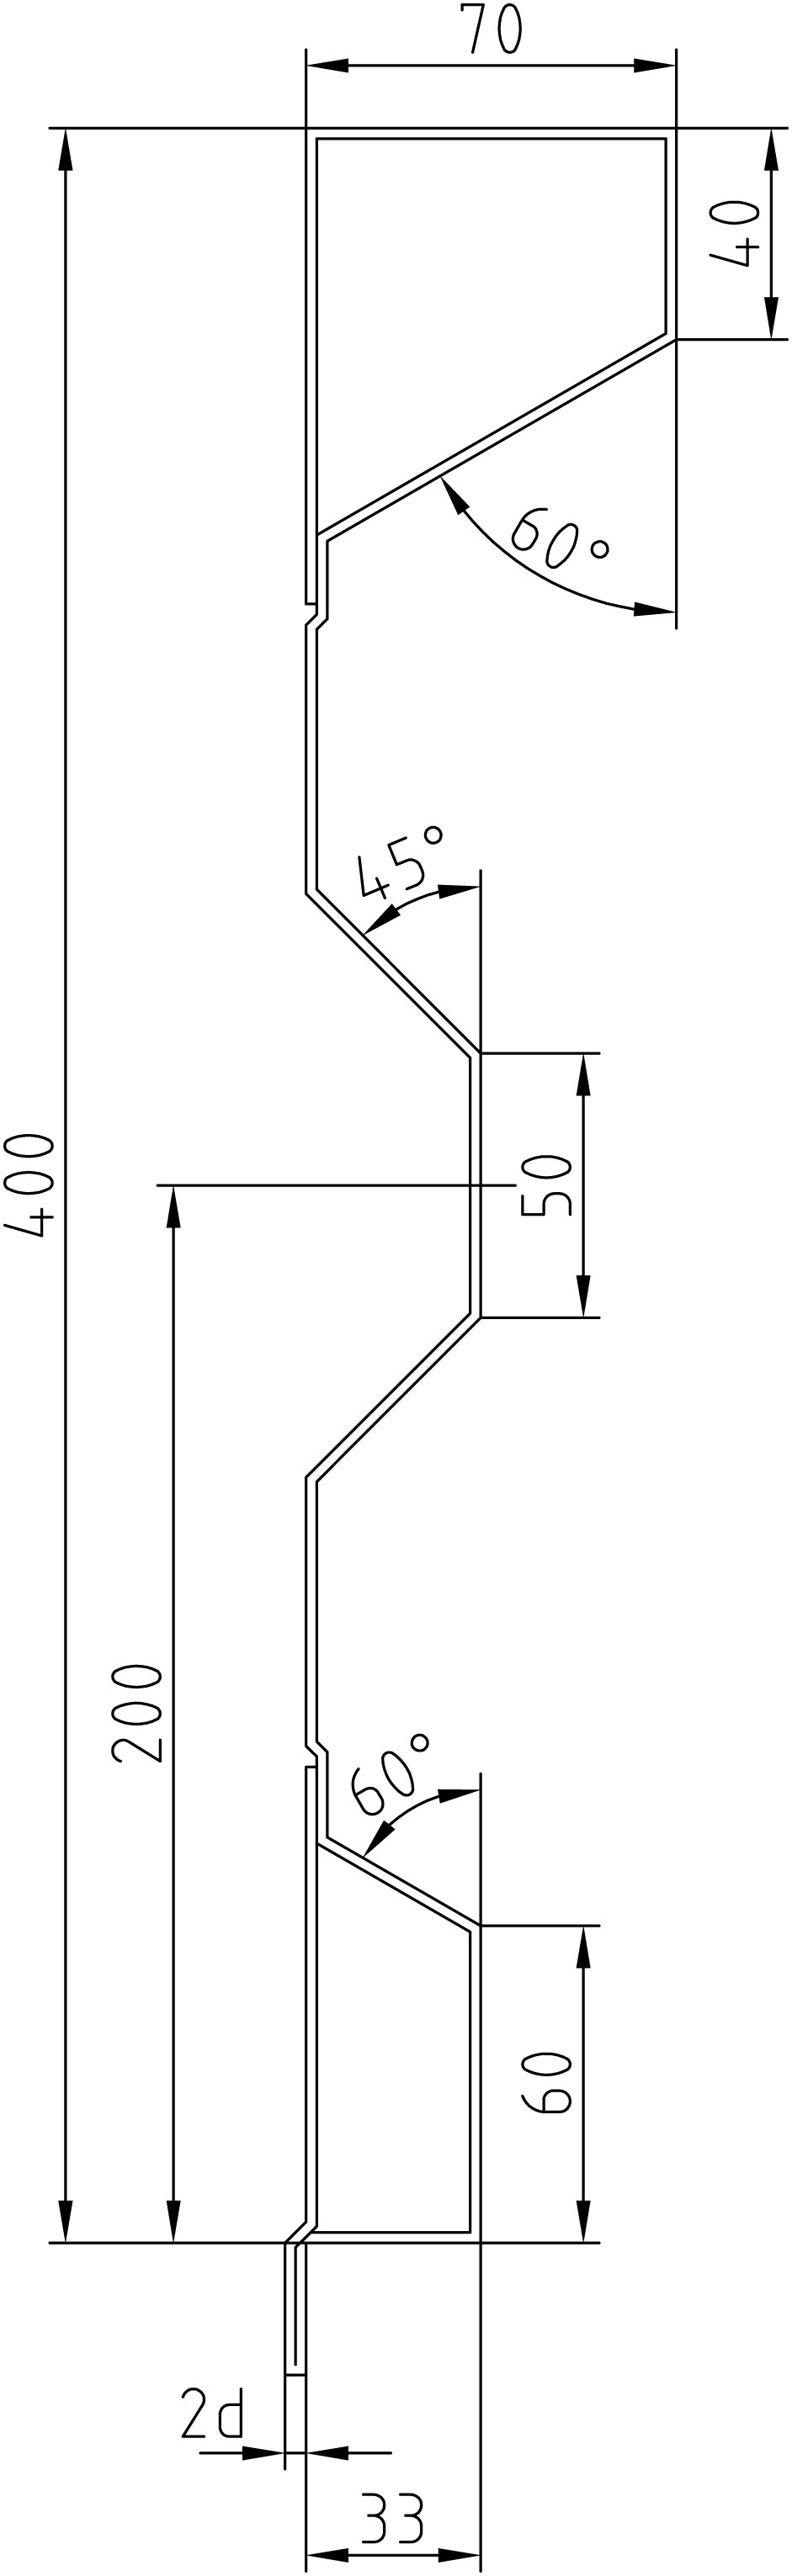 Brantner Kipper und Anhänger - 400x2x6220 attachment wall with trailing edges